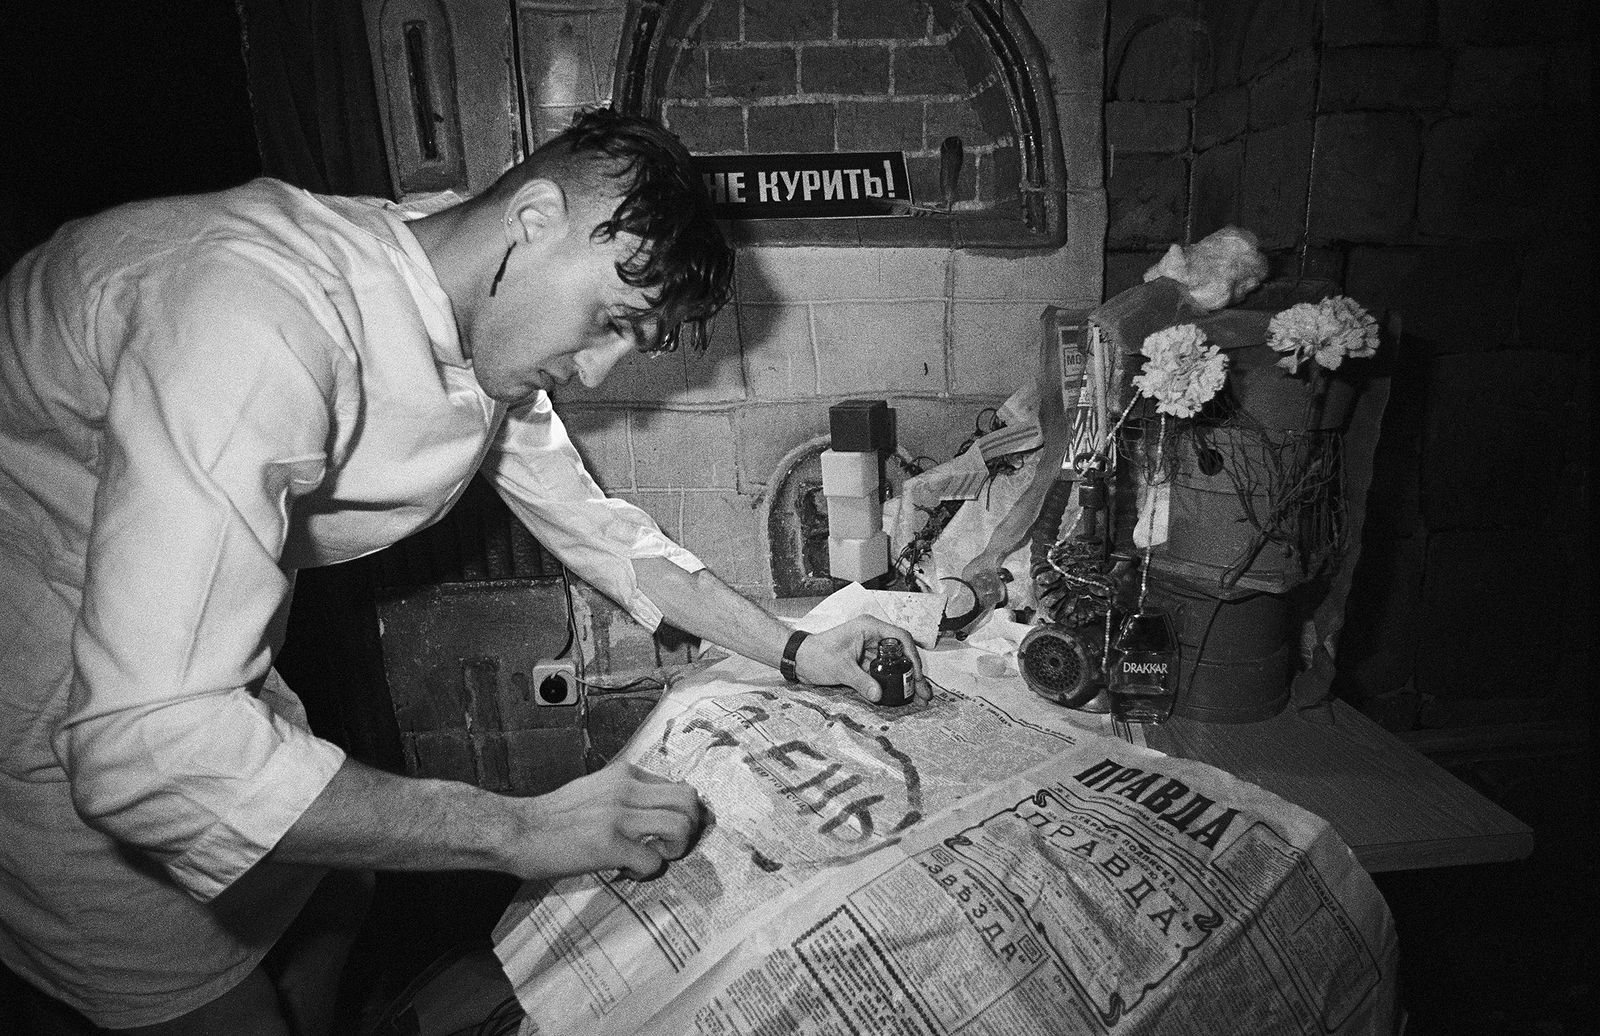 Андрей Безукладников. Совриск. Гор Чахал. Москва. 1986